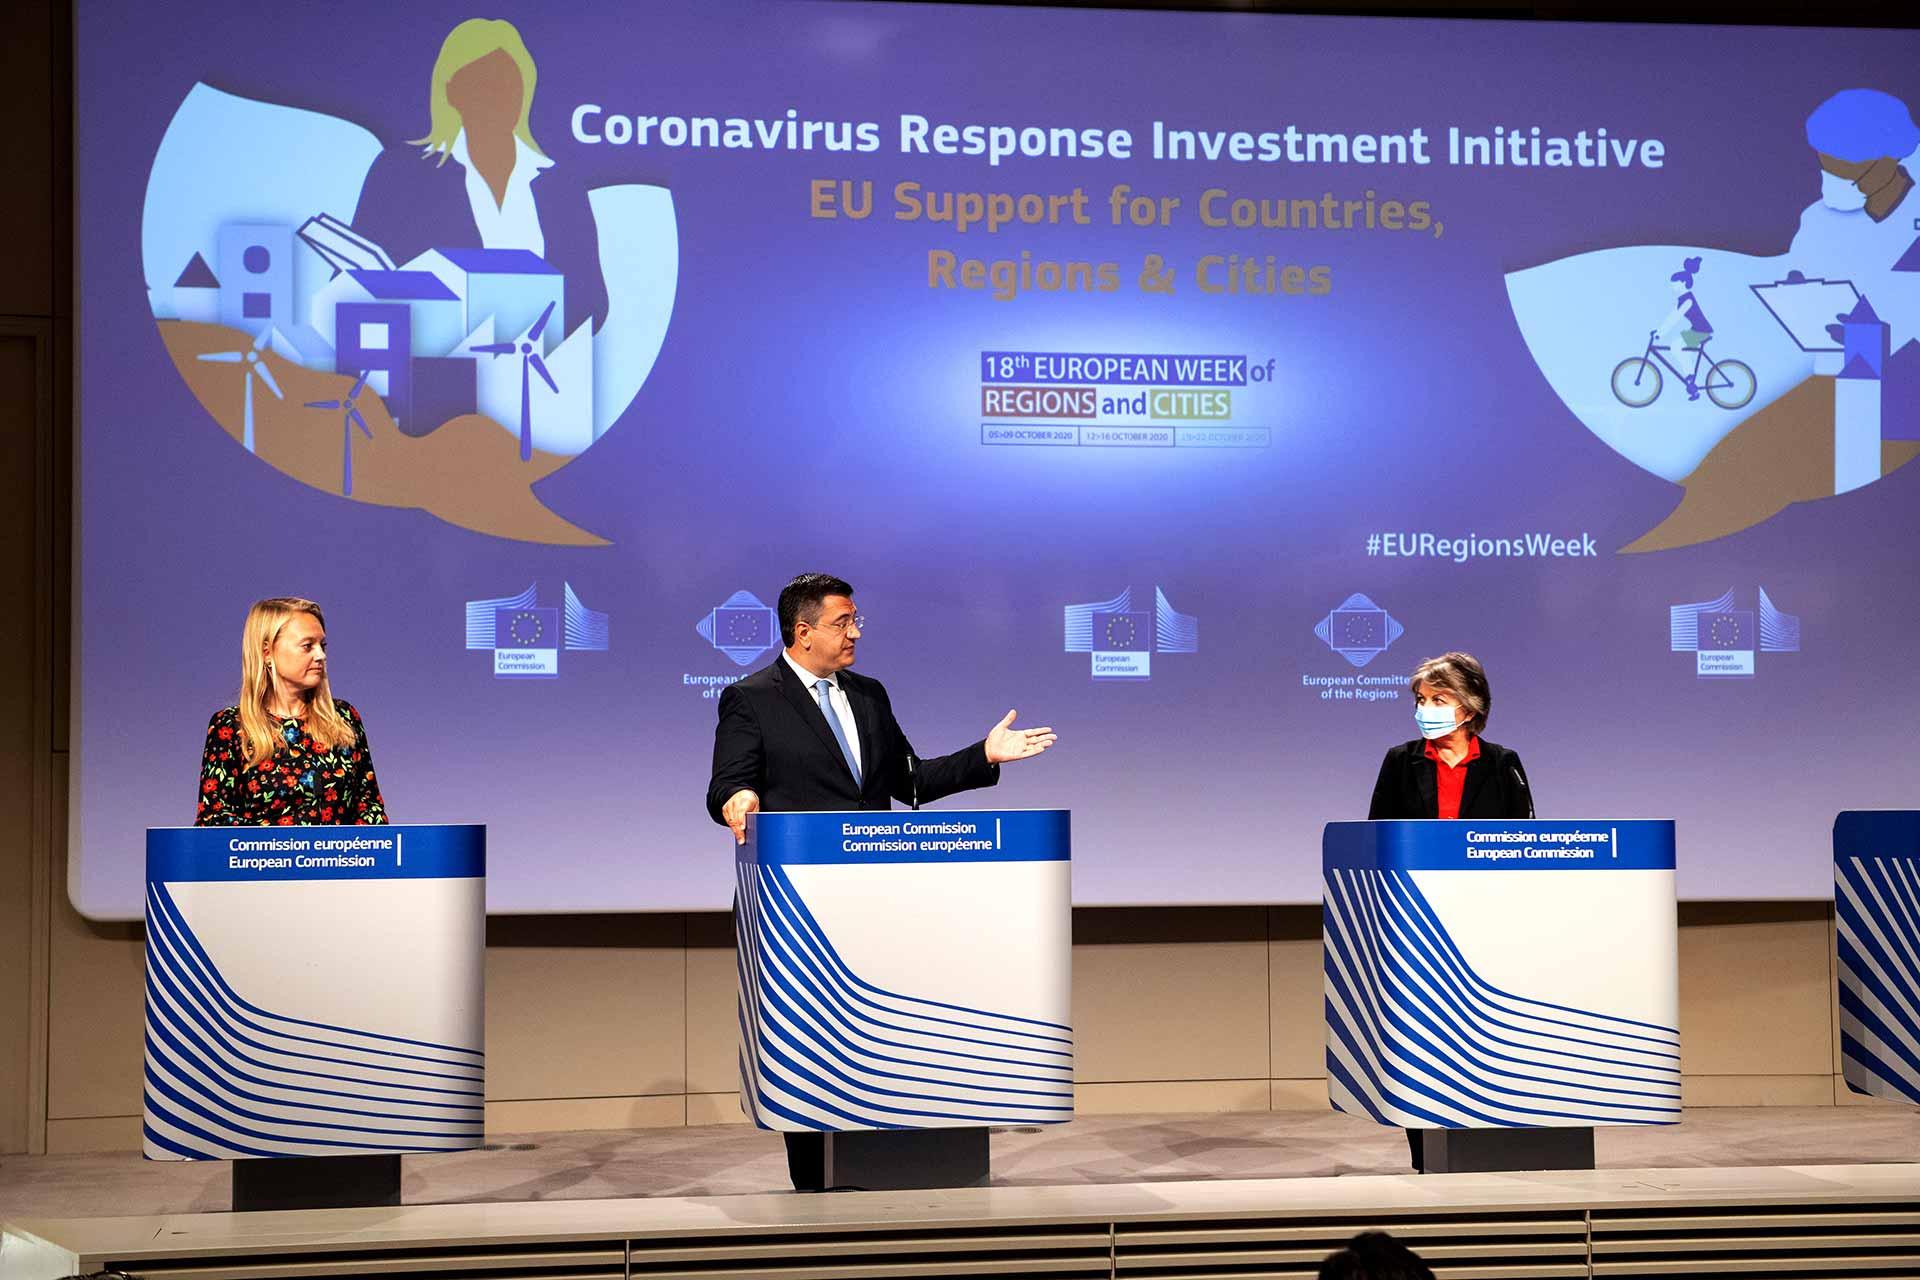 Coronavirus Response Investment Initiative (CRII) with local authorities, Regions and Cities